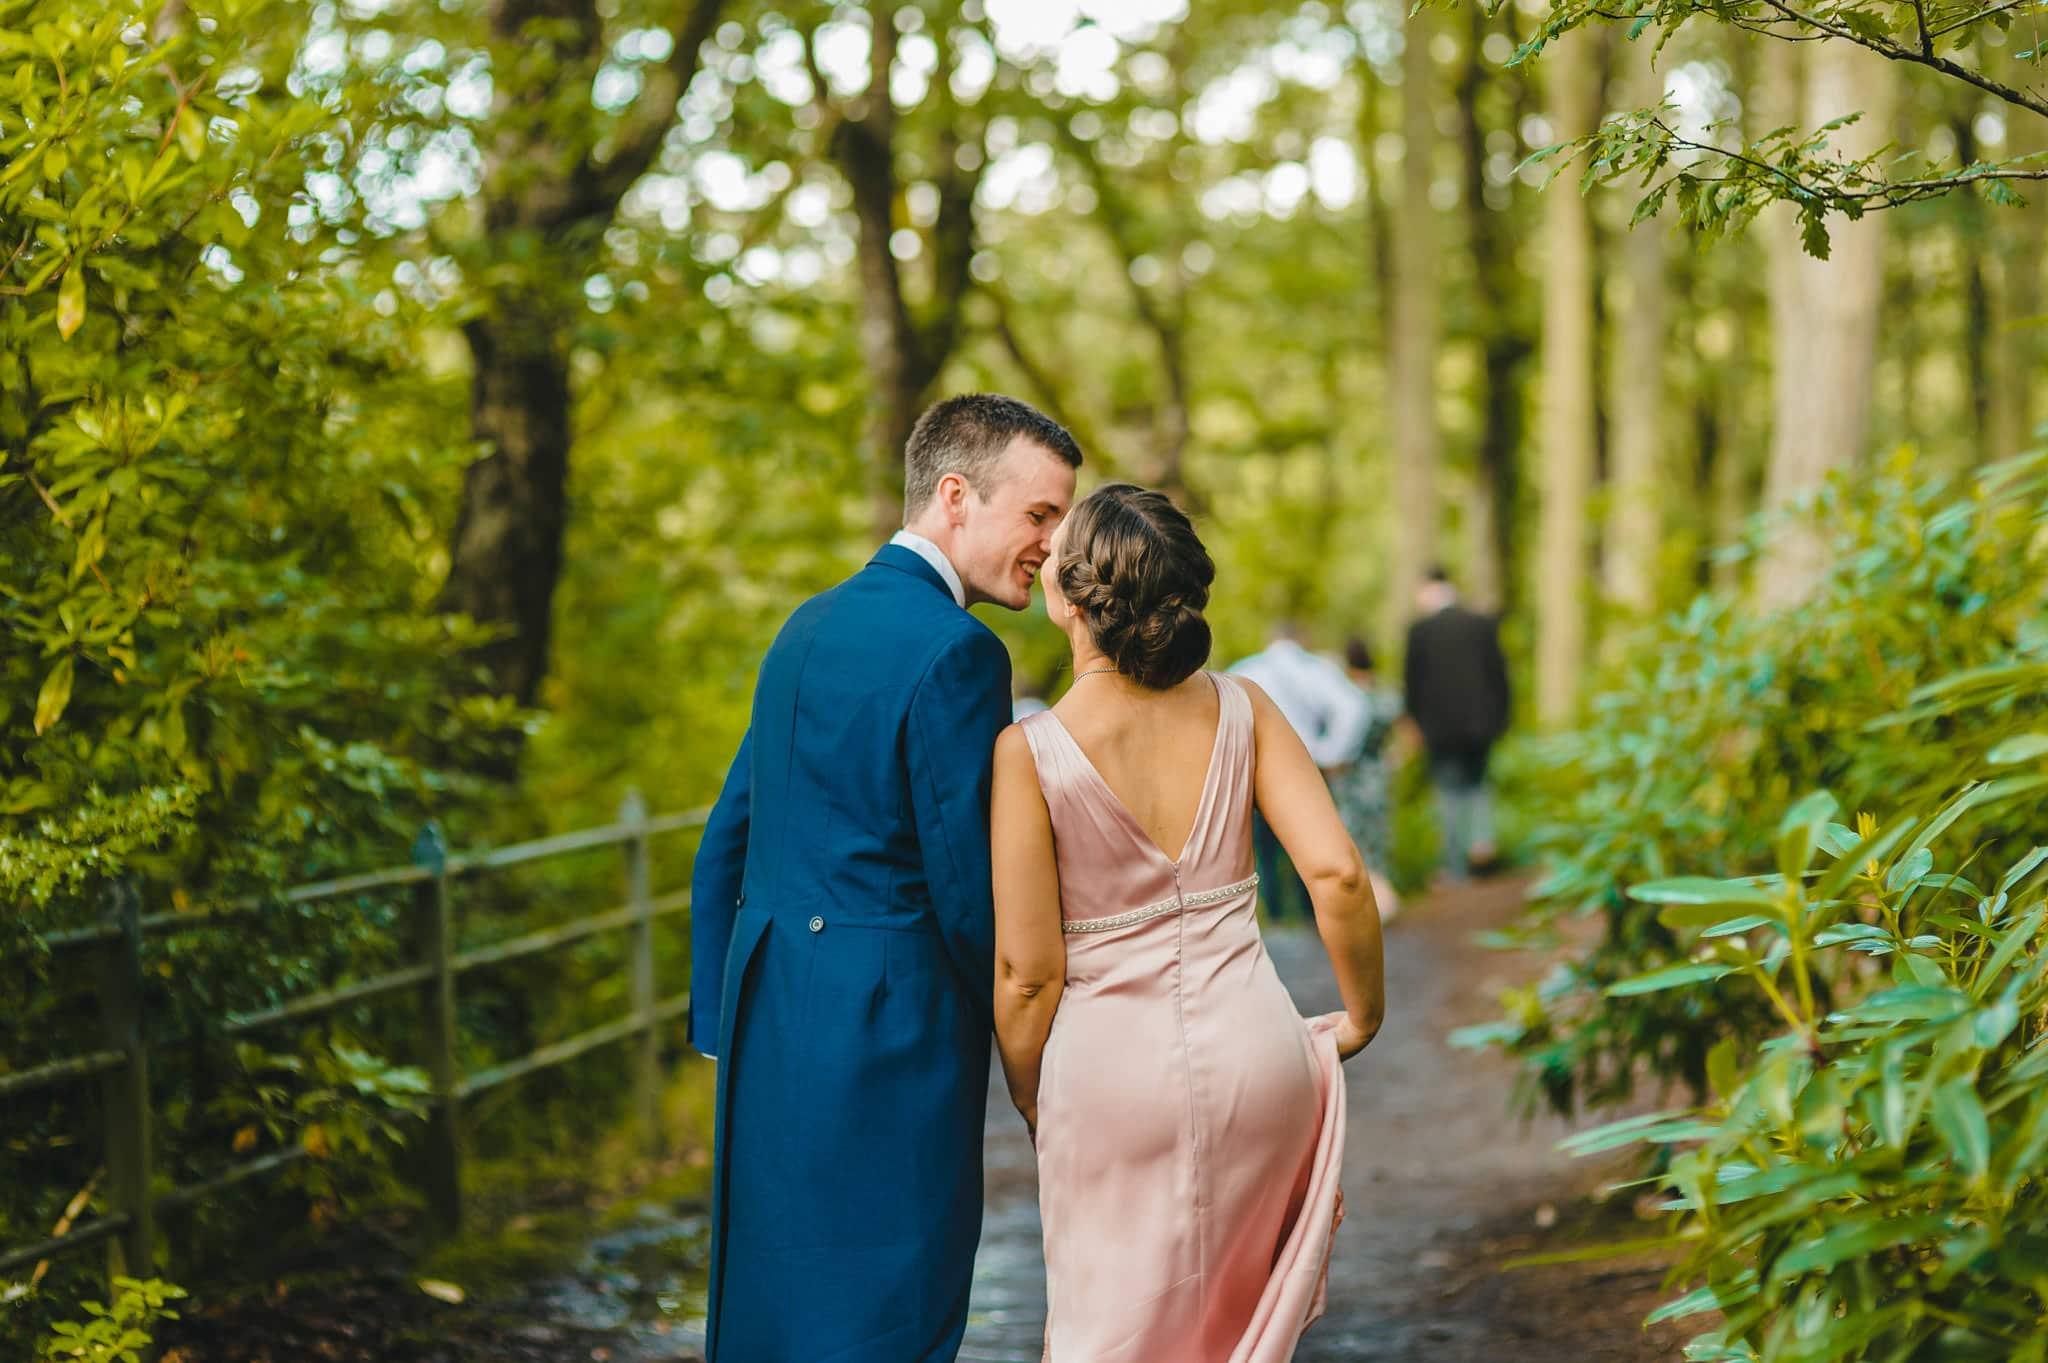 Wedding photography at Y Talbot Hotel in Tregaron, Wales   Tina + Phil 38